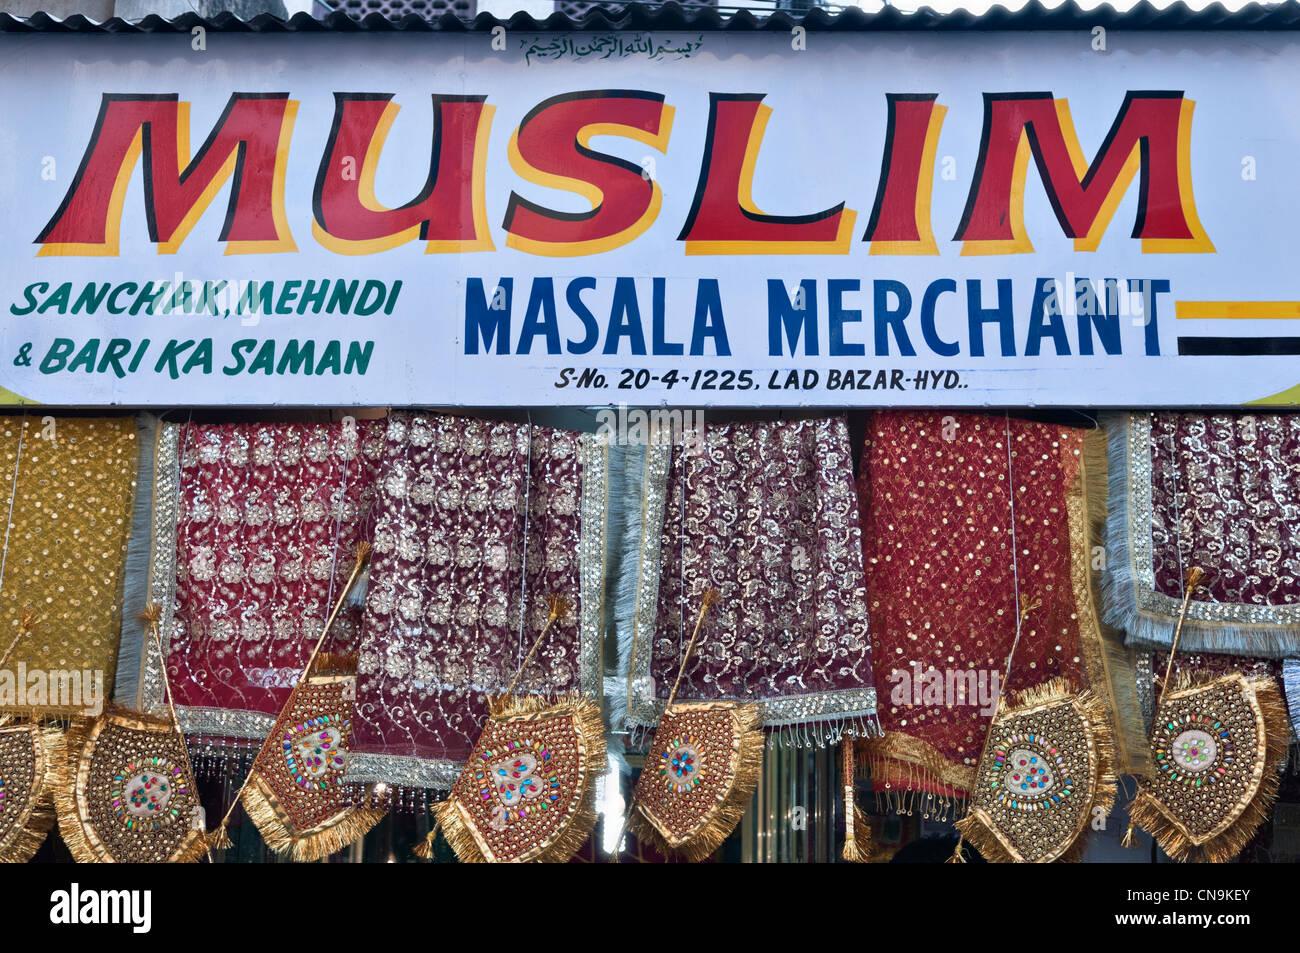 Abiti musulmani shop Laad Bazaar di Hyderabad, Andhra Pradesh in India Immagini Stock